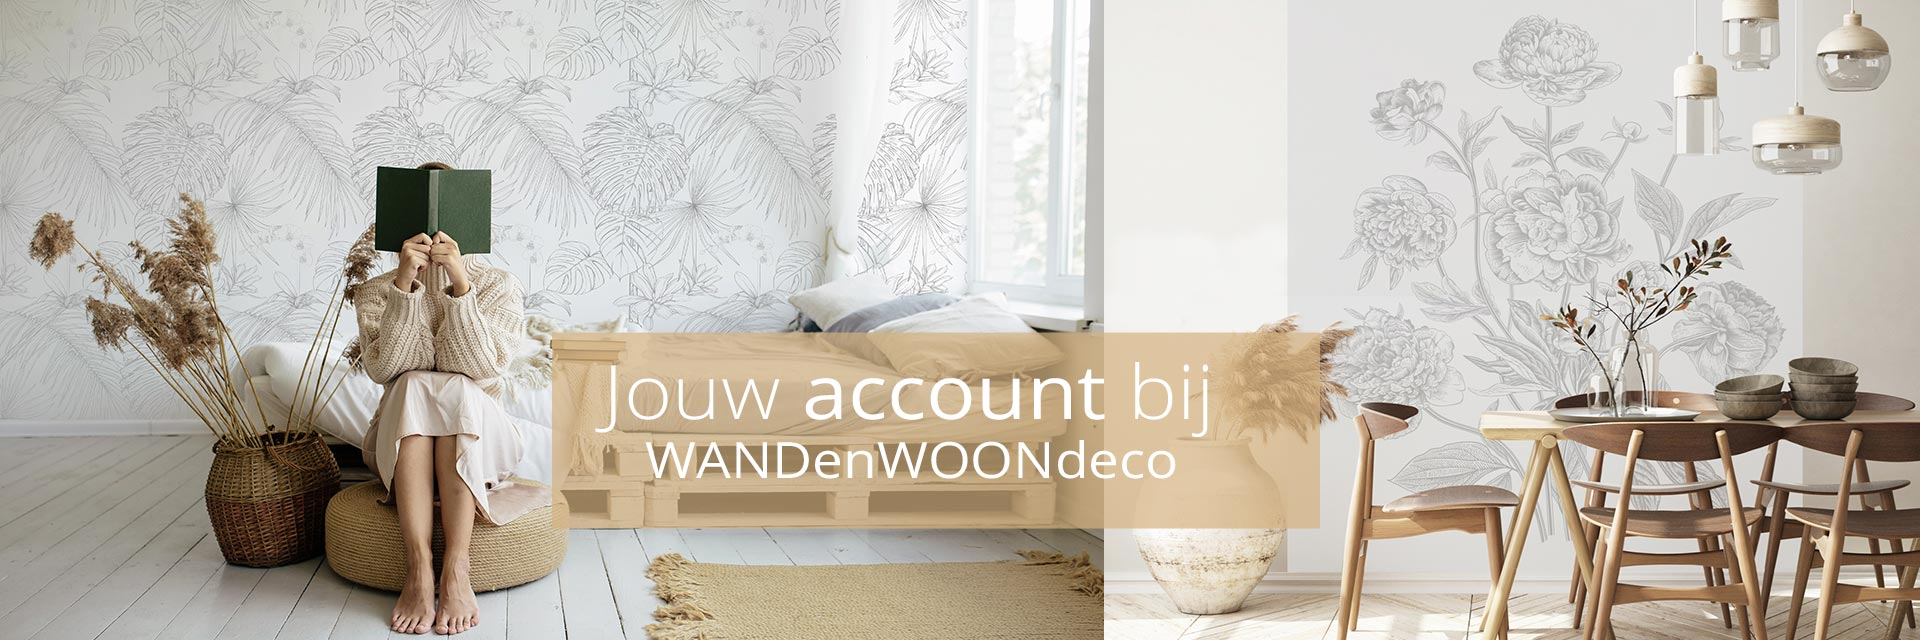 WANDenWOONdeco.nl jouw account